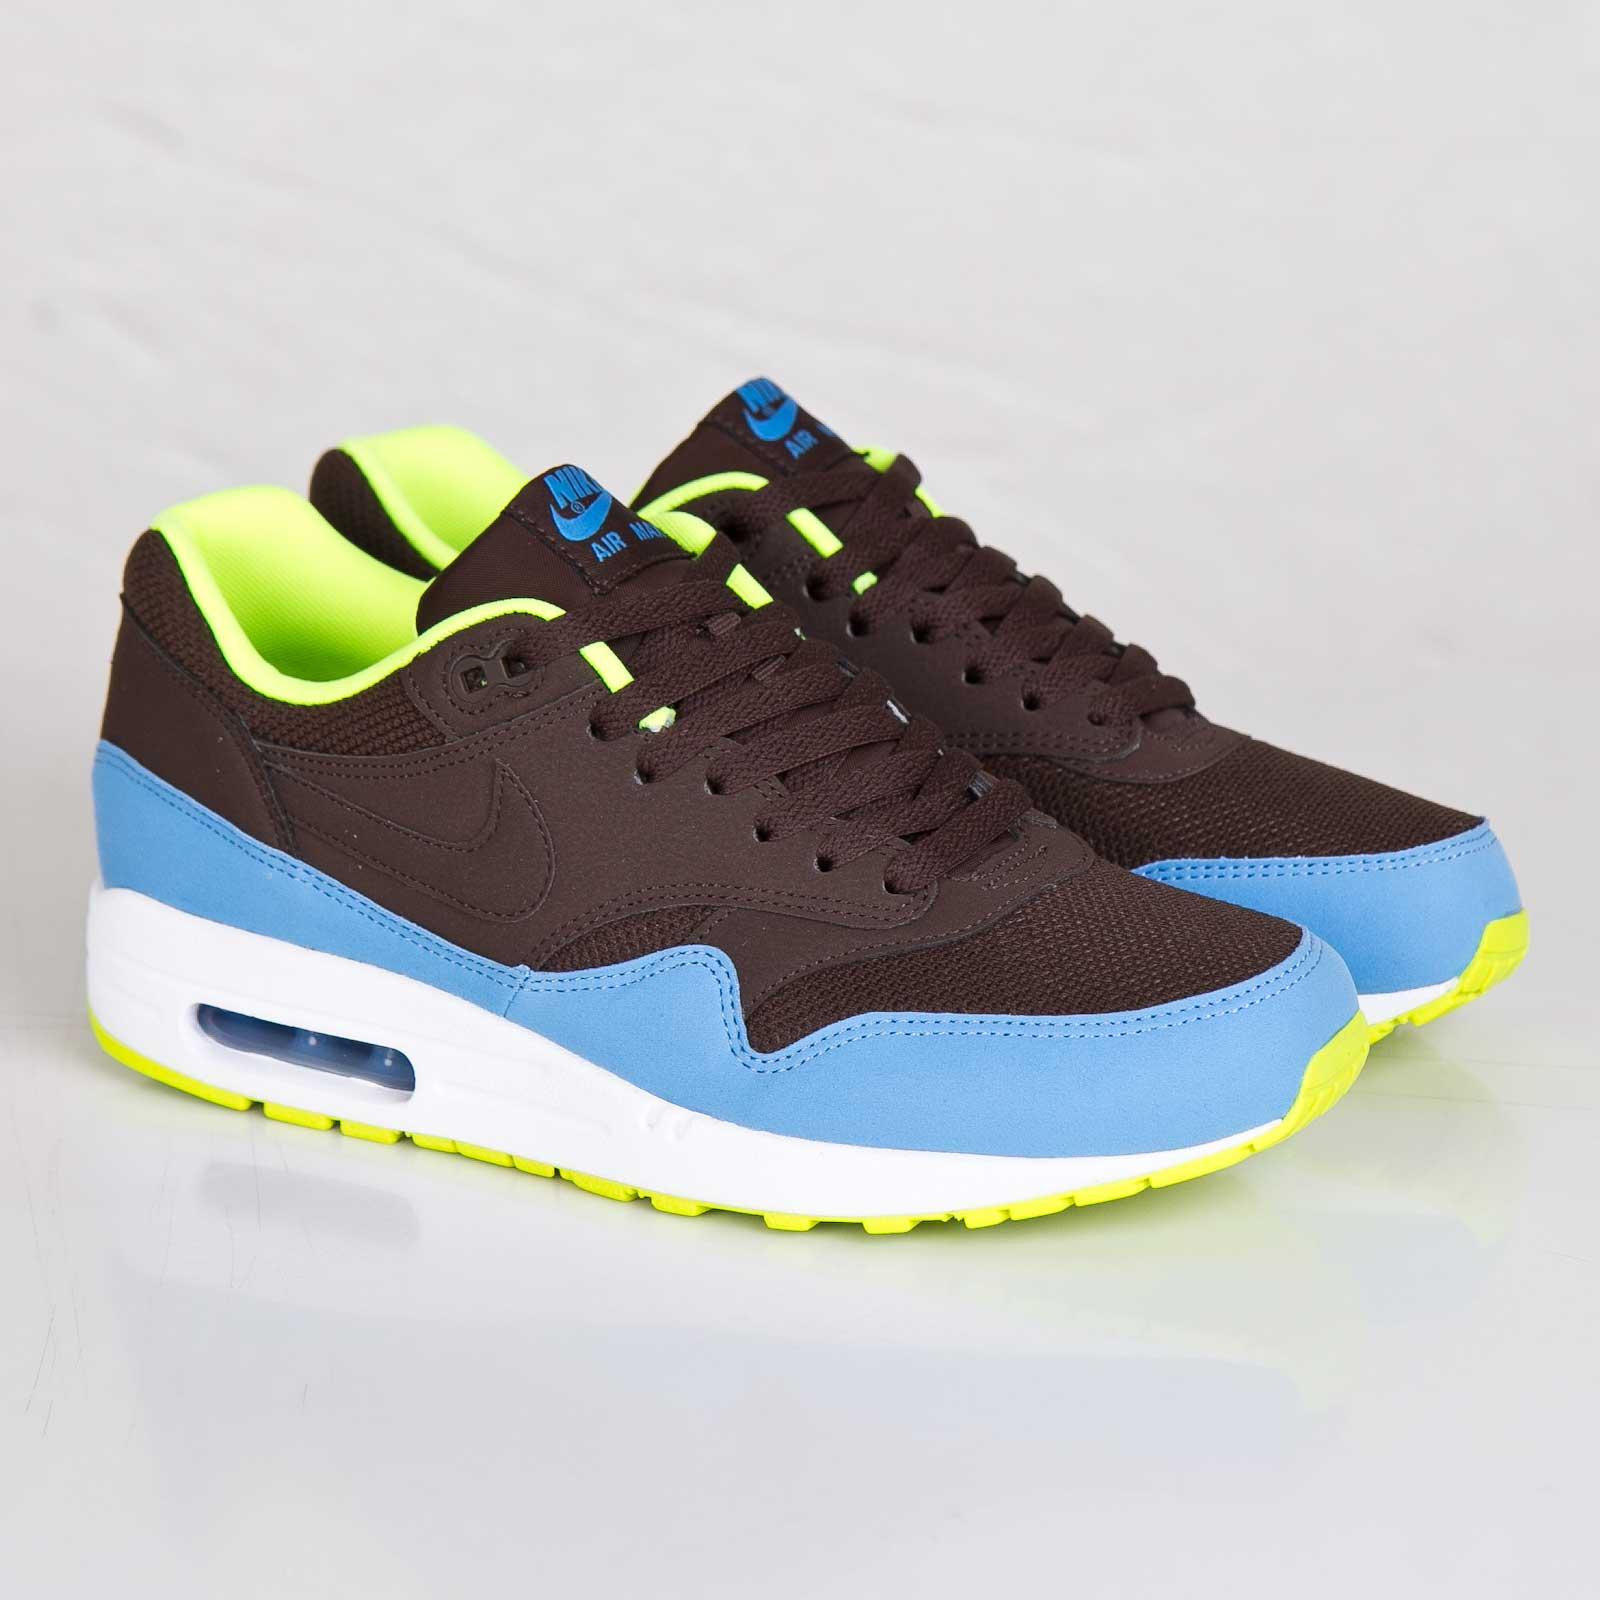 innovative design 3d57c bf6cb Nike Air Max 1 Essential